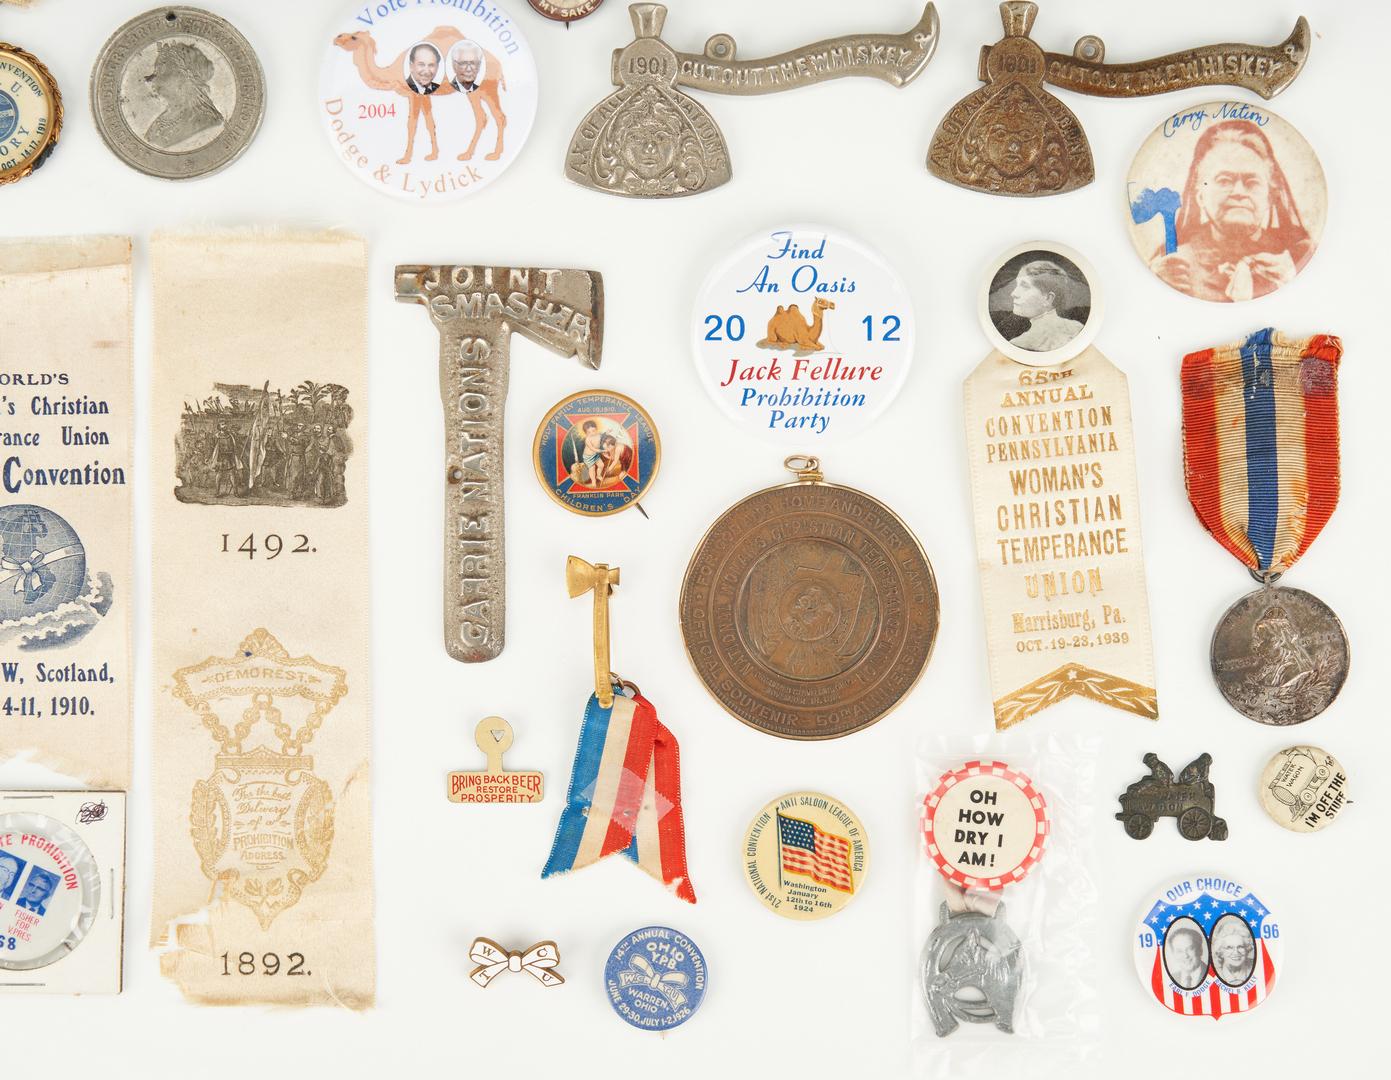 Lot 1020: 56 Prohibition/Temperance Ephemera Items, incl. Buttons